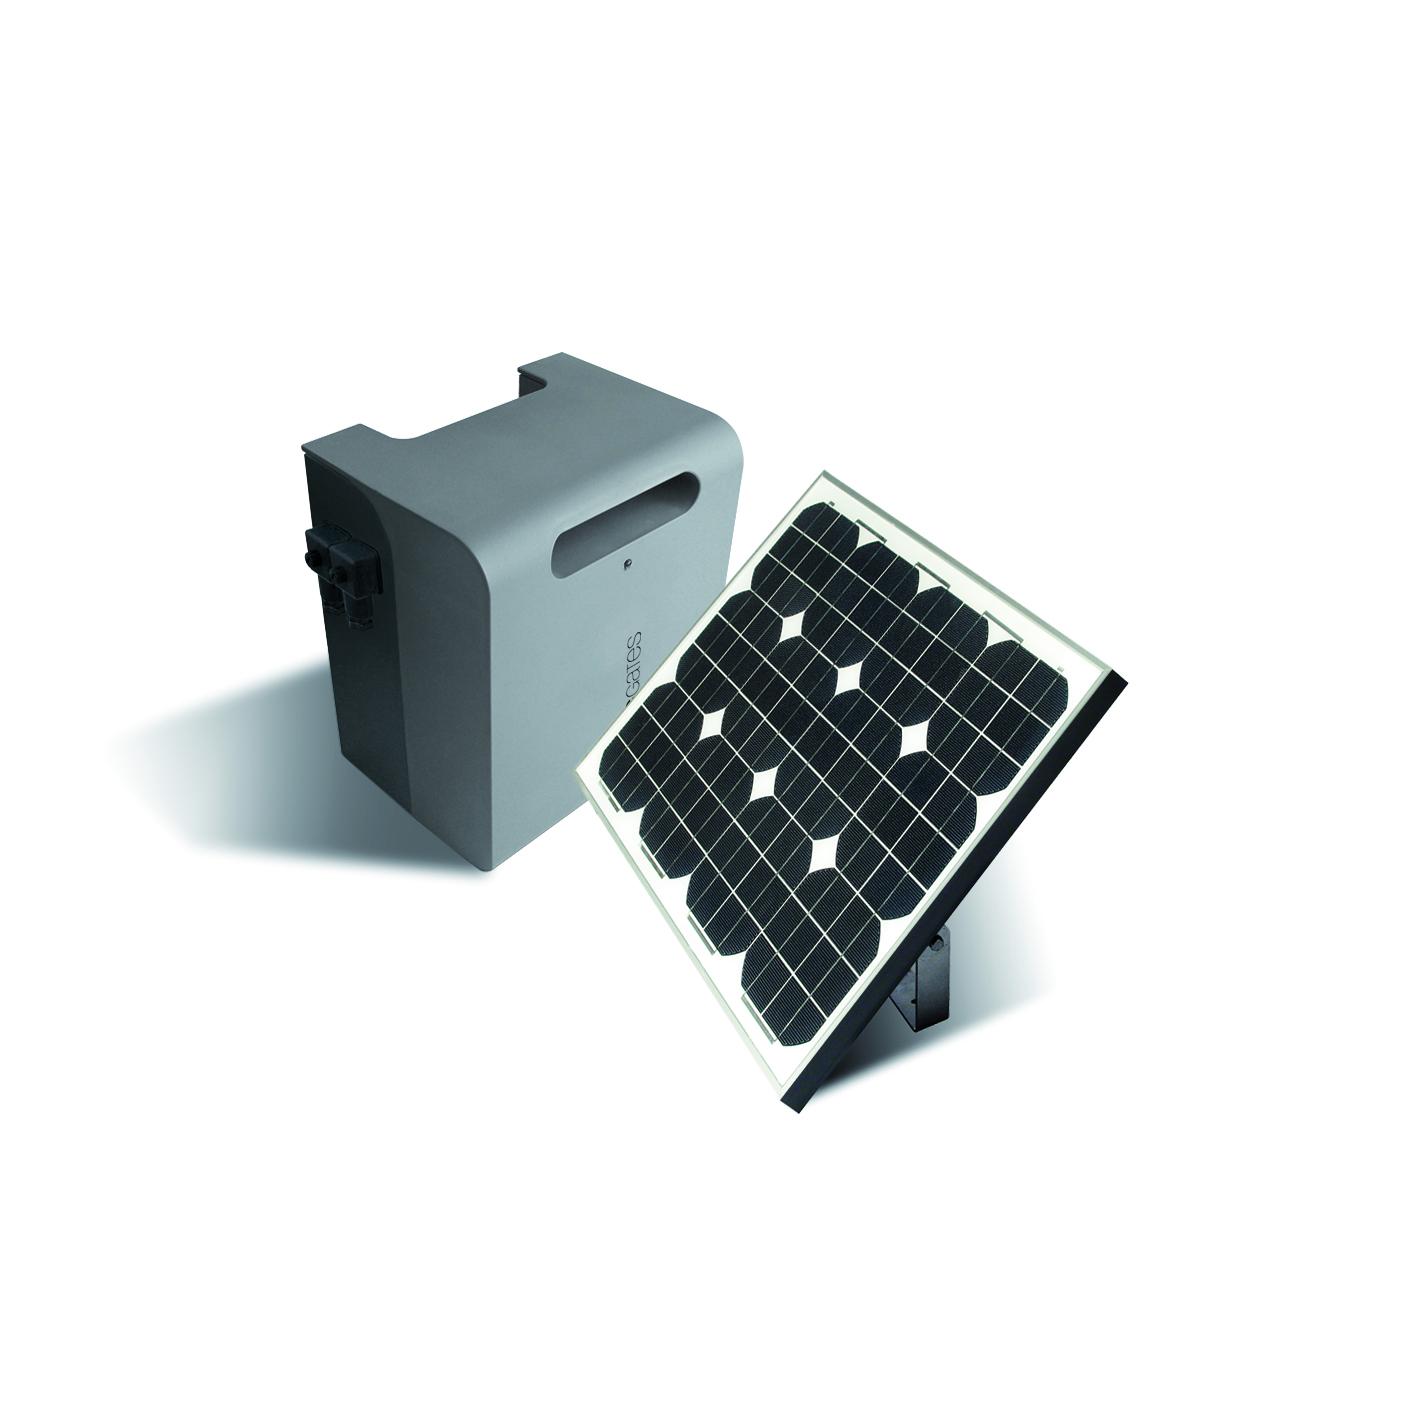 kit solaire complet avec batterie europe automatismes. Black Bedroom Furniture Sets. Home Design Ideas